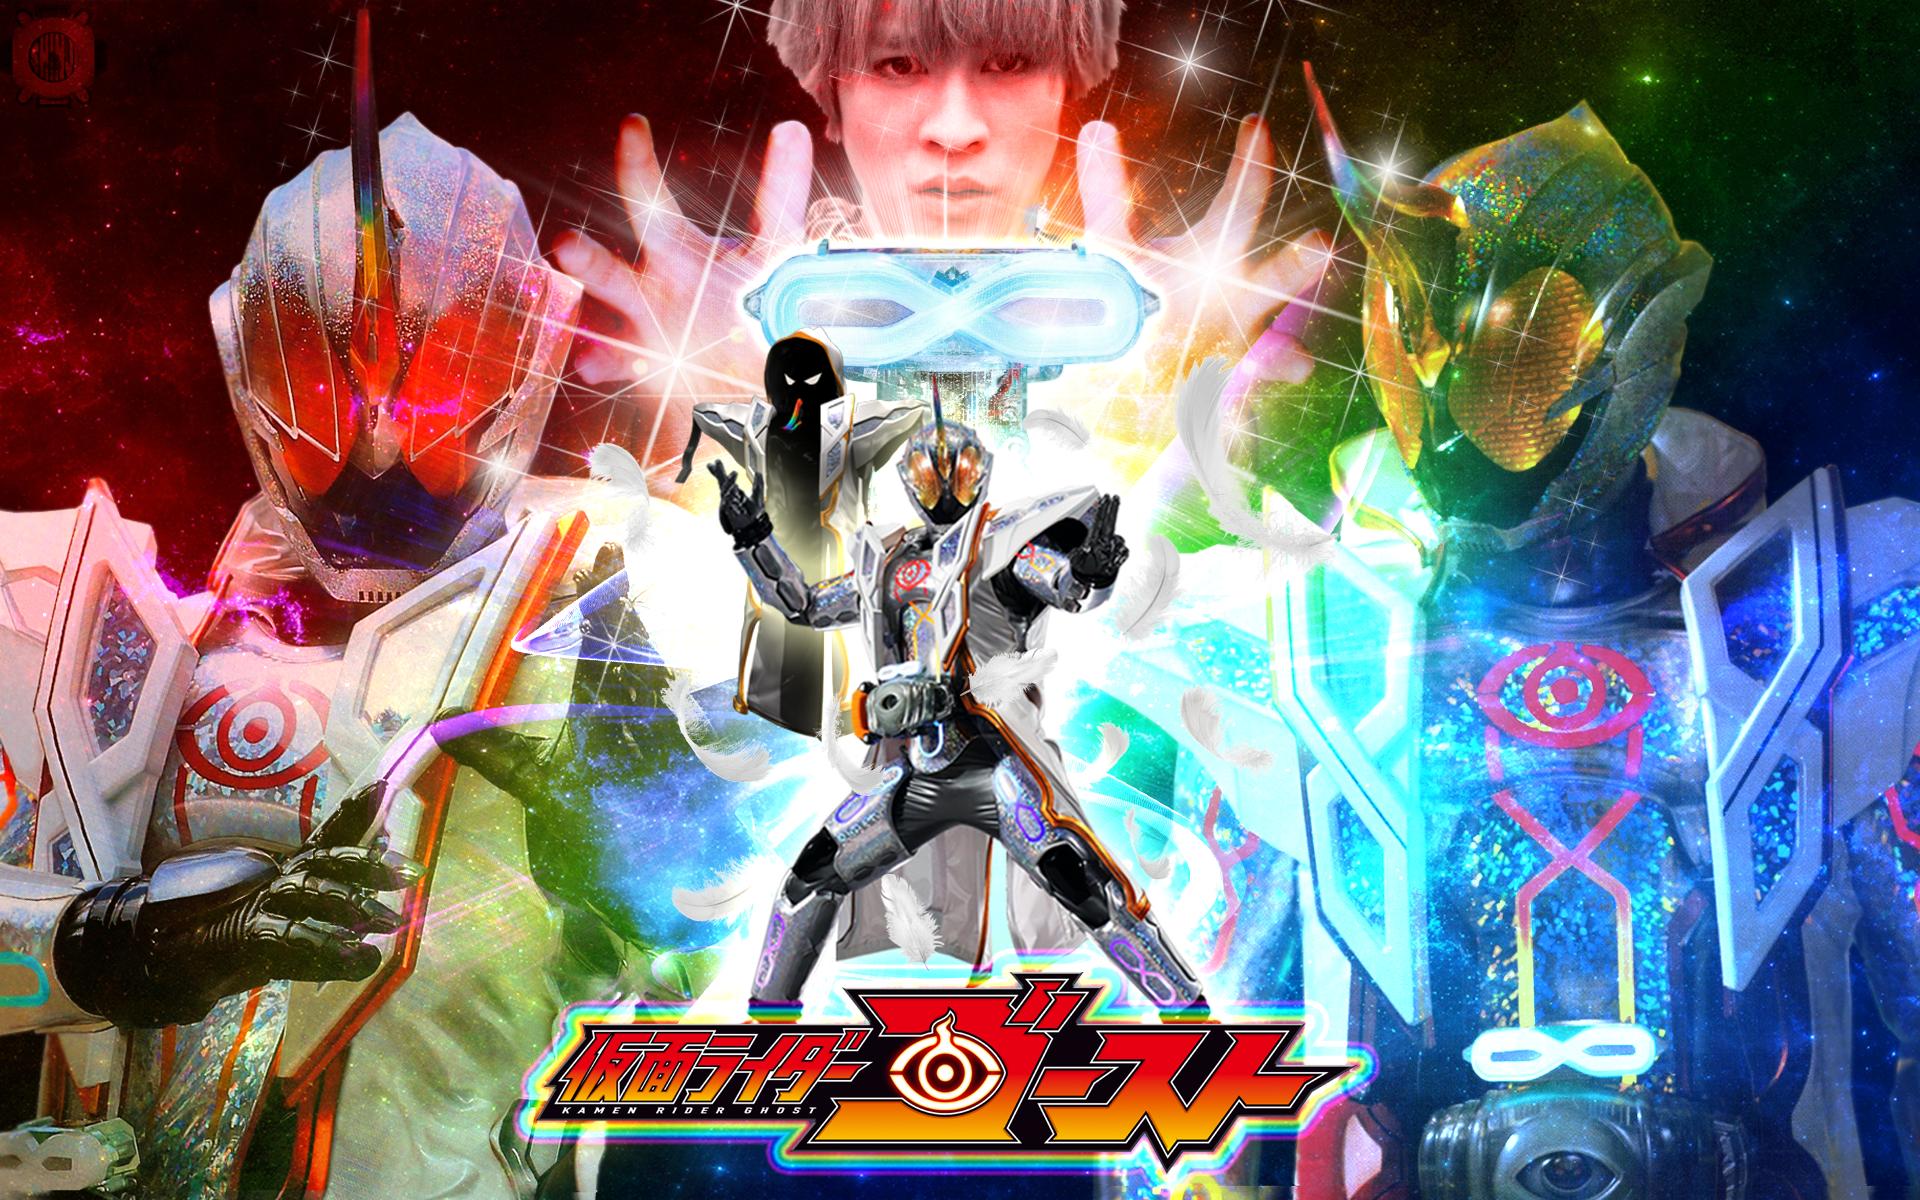 Kamen Rider Ghost Mugen Damashii Wallpaper by malecoc on DeviantArt